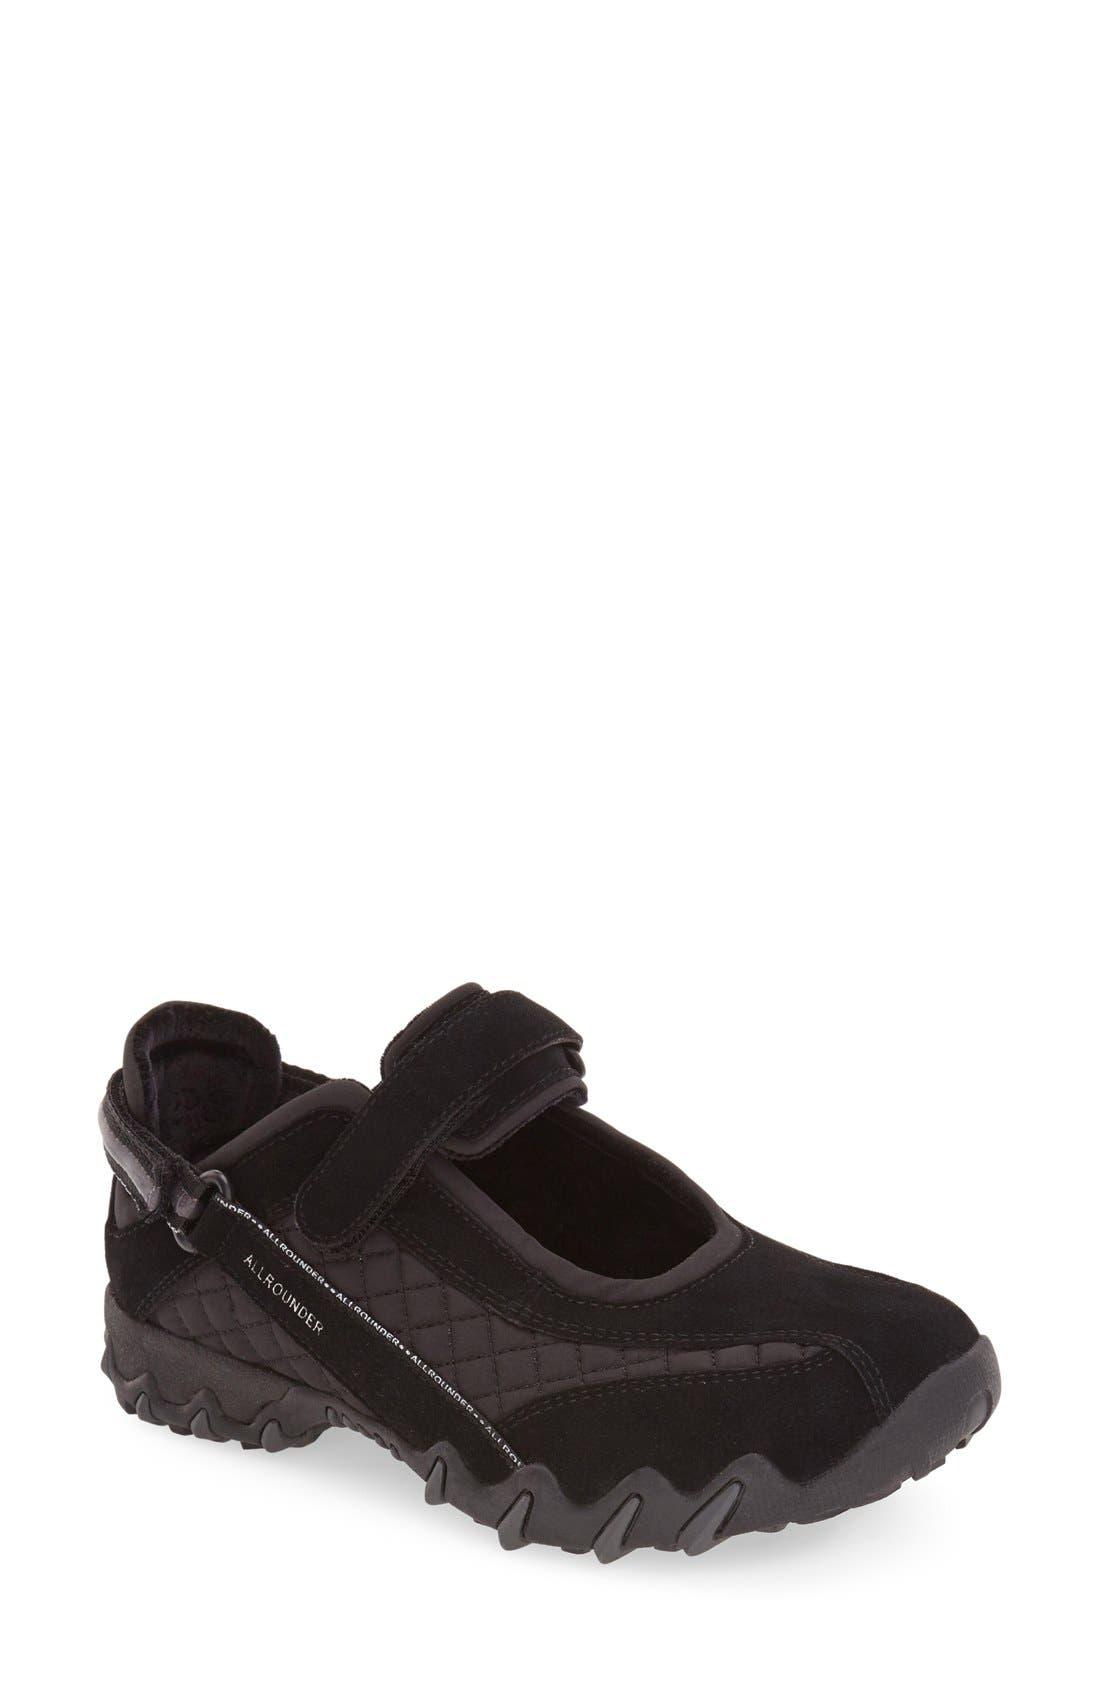 'Niro' Athletic Shoe,                         Main,                         color, BLACK/ BLACK SUEDE